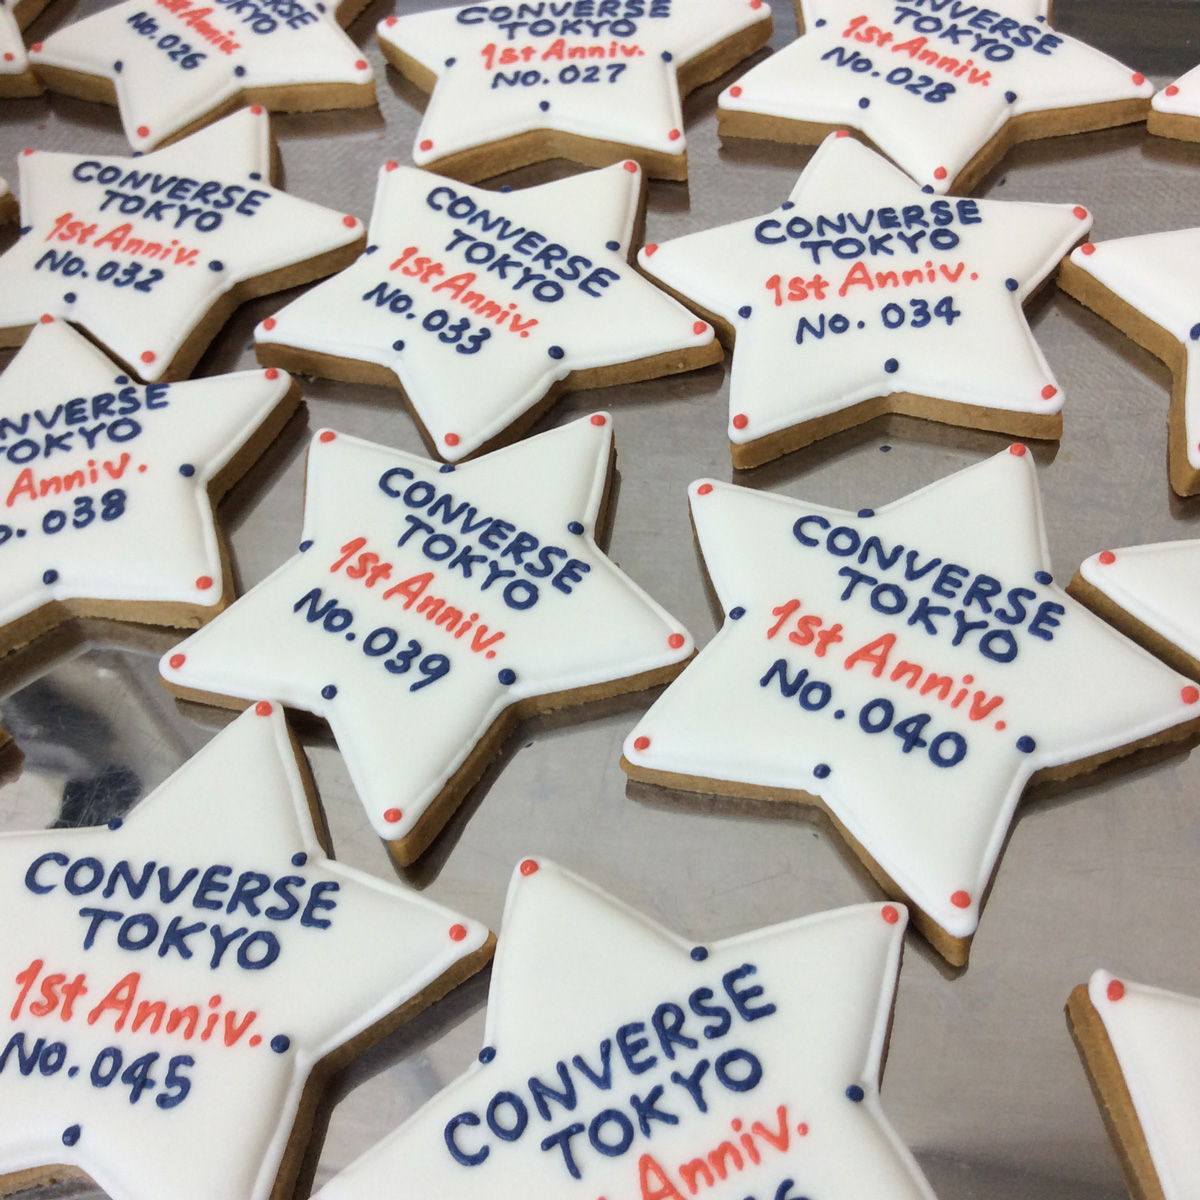 「CONVERSE TOKYO」1周年記念ノベルティクッキー